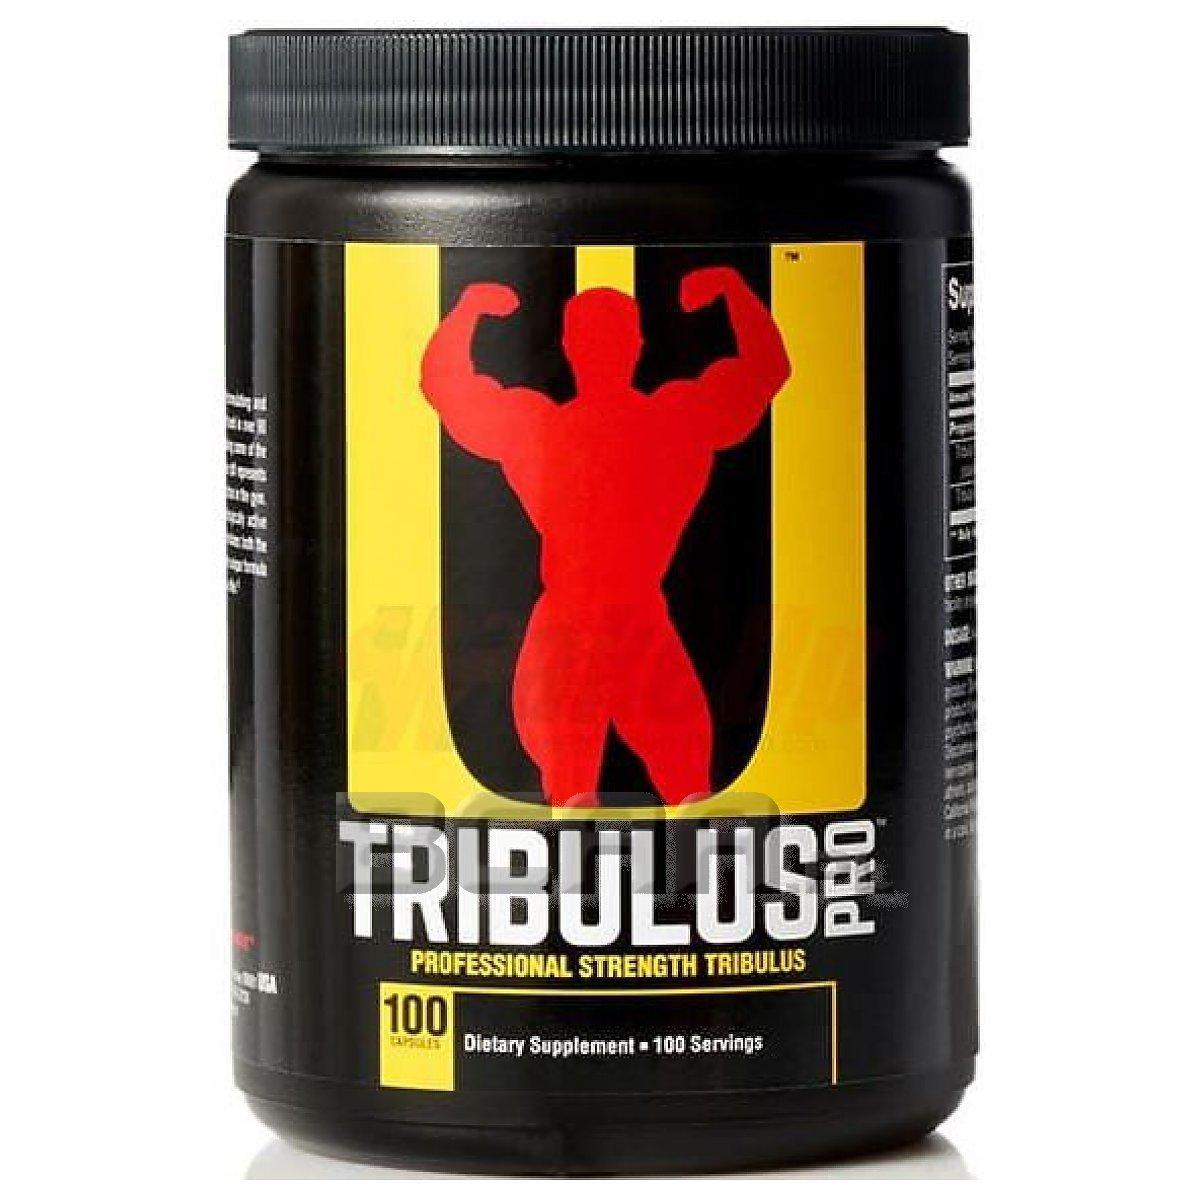 Tribulus pro universal